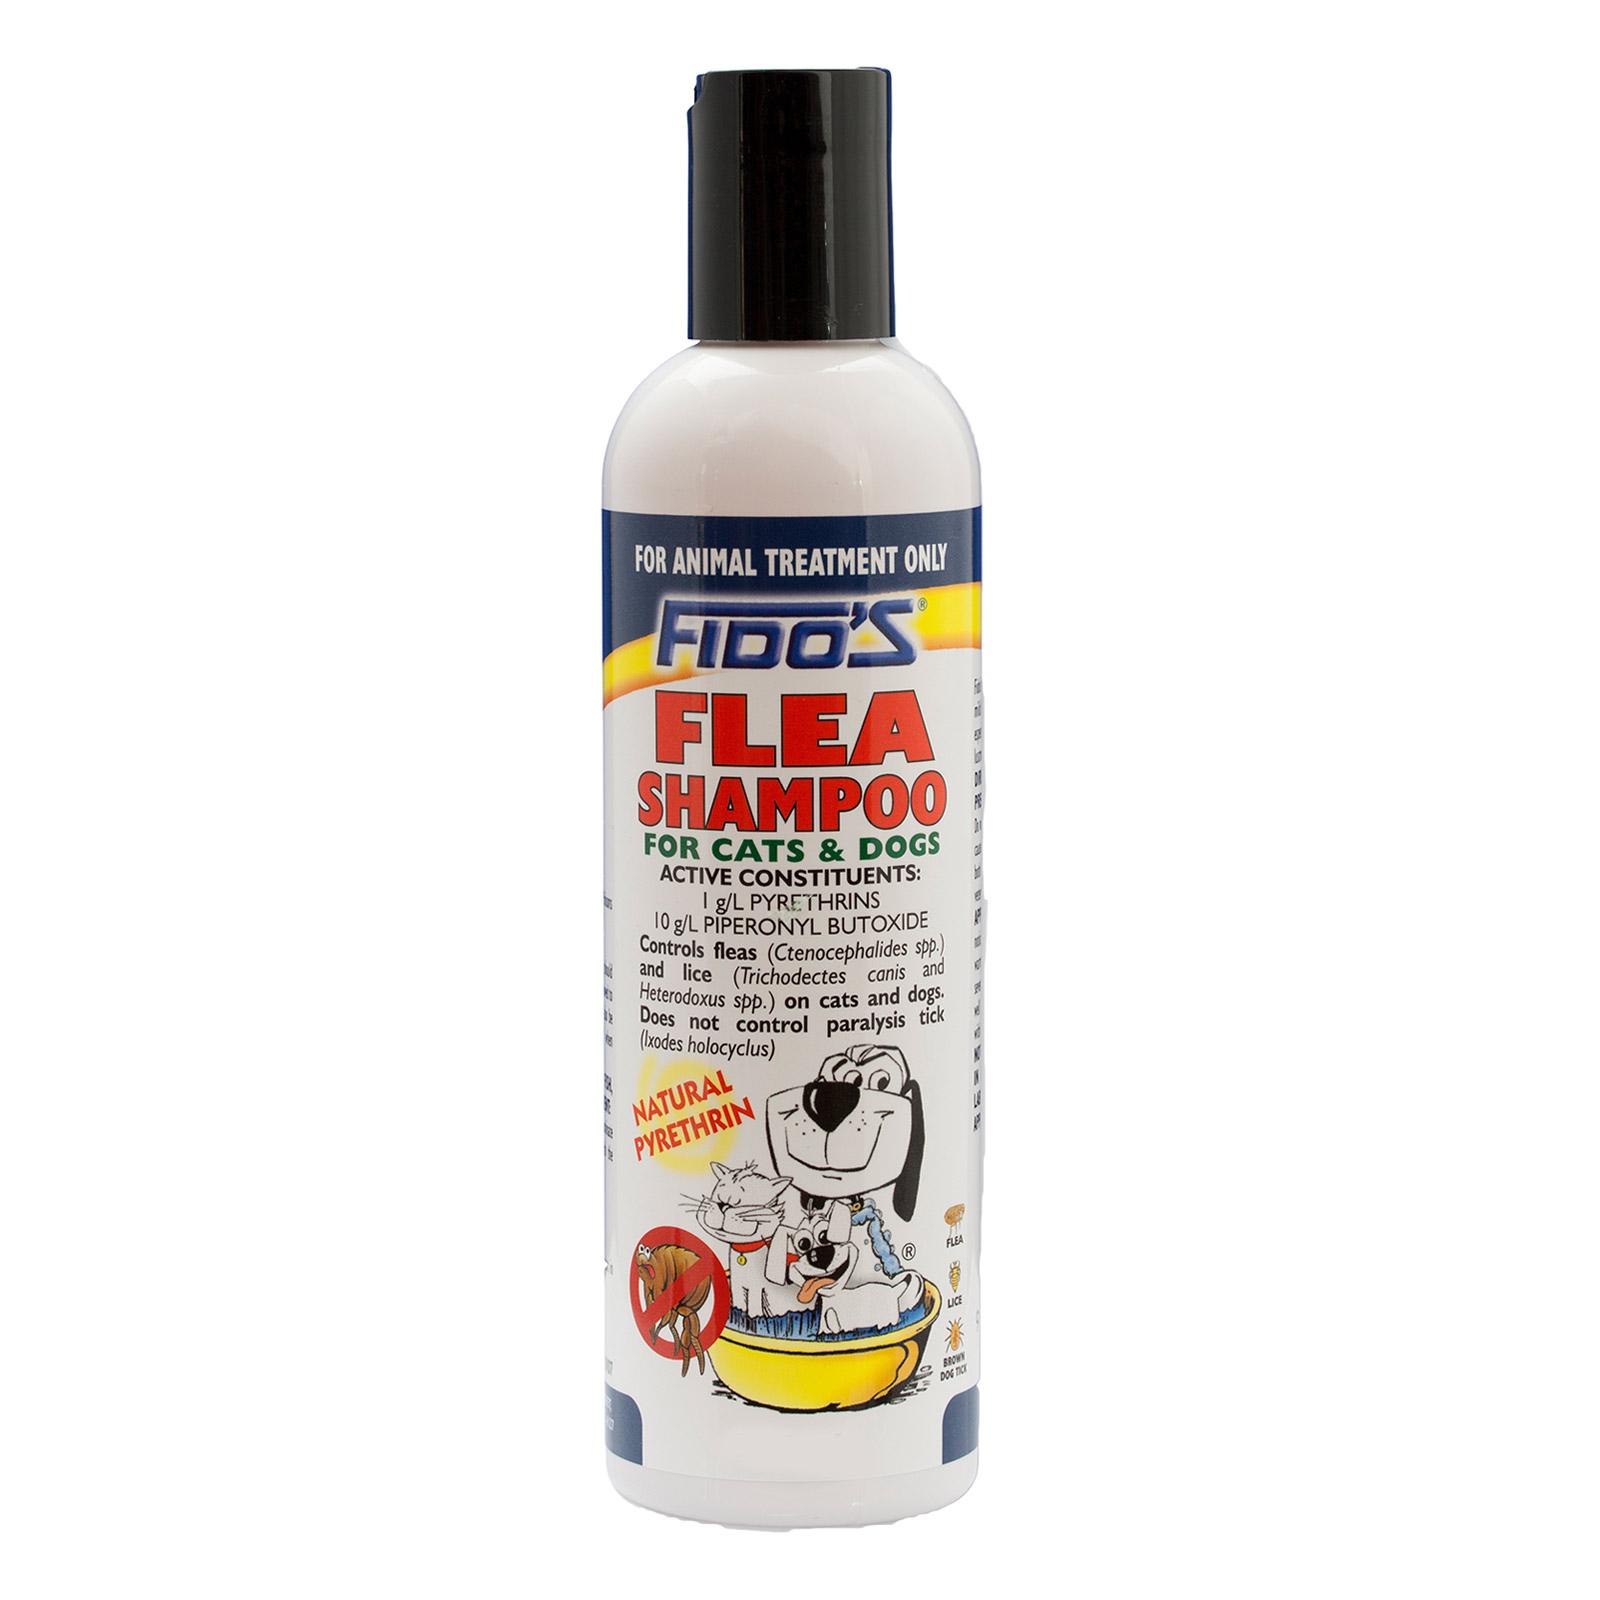 Fidos Flea Shampoo For Dogs